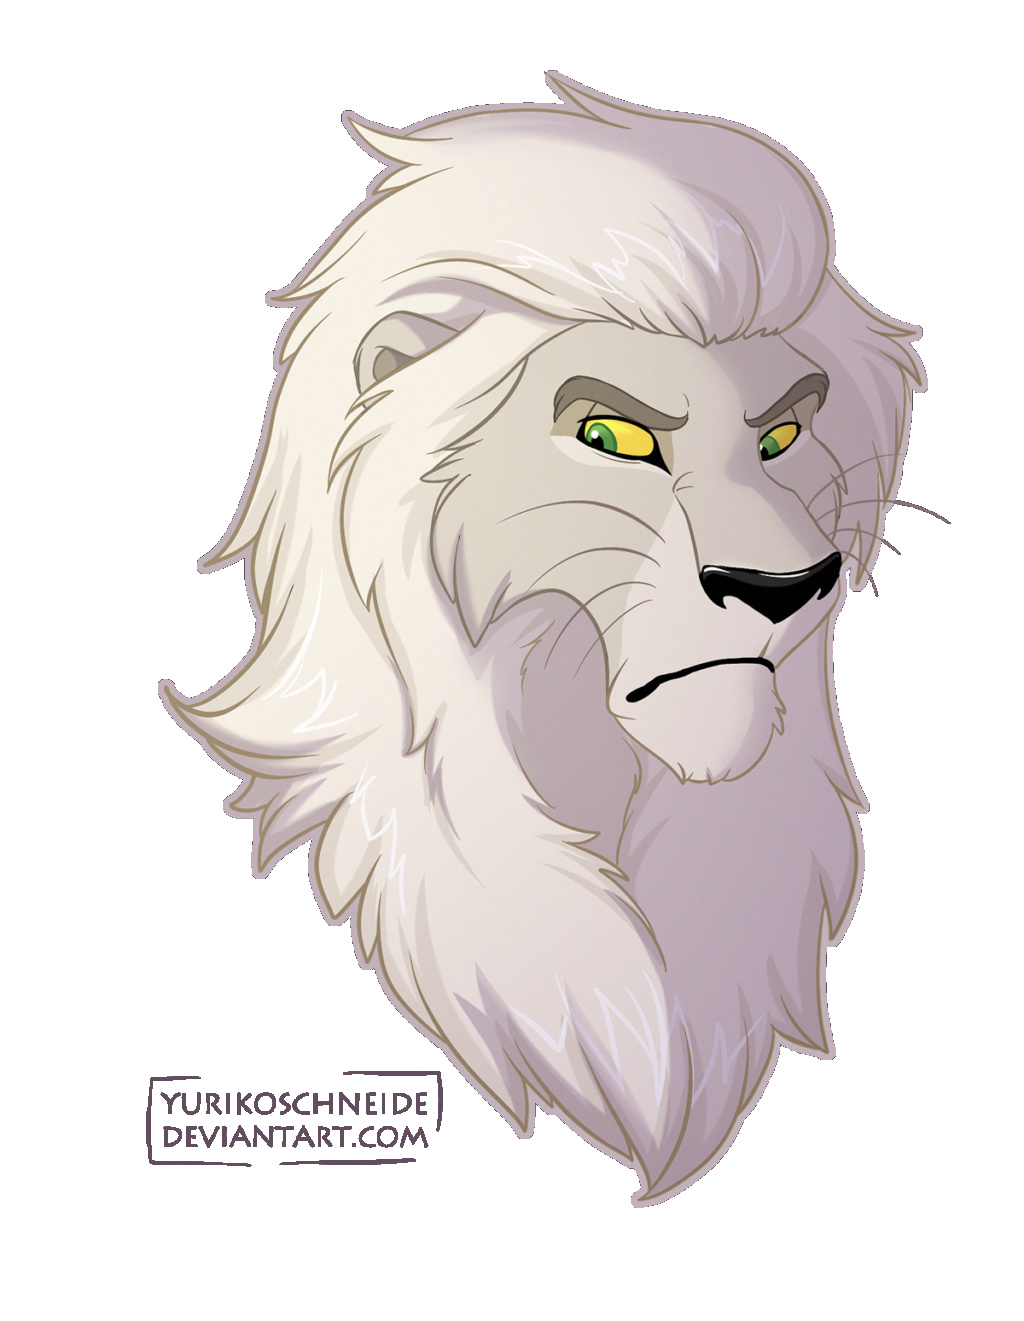 Personaje eliminado, Mheetu Jeanze11